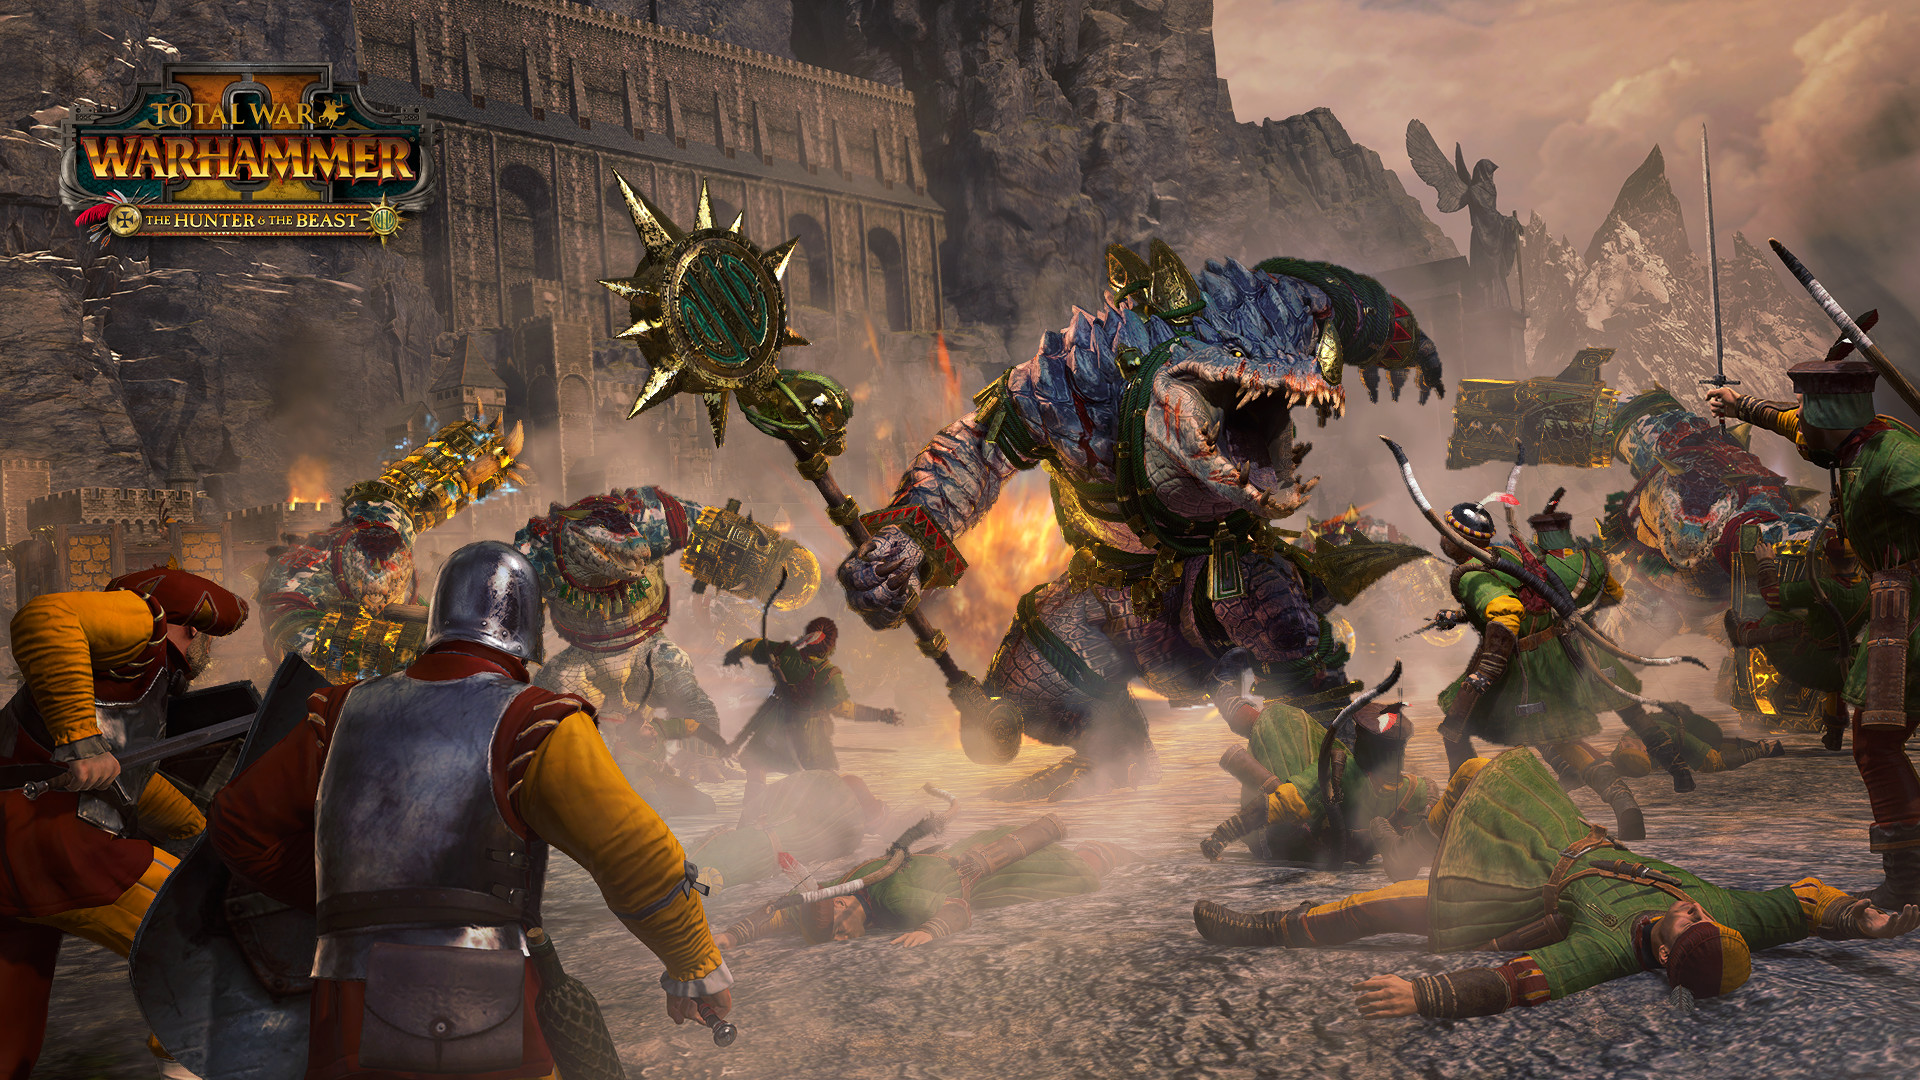 Total War: WARHAMMER II - The Hunter & The Beast Fiyat Karşılaştırma